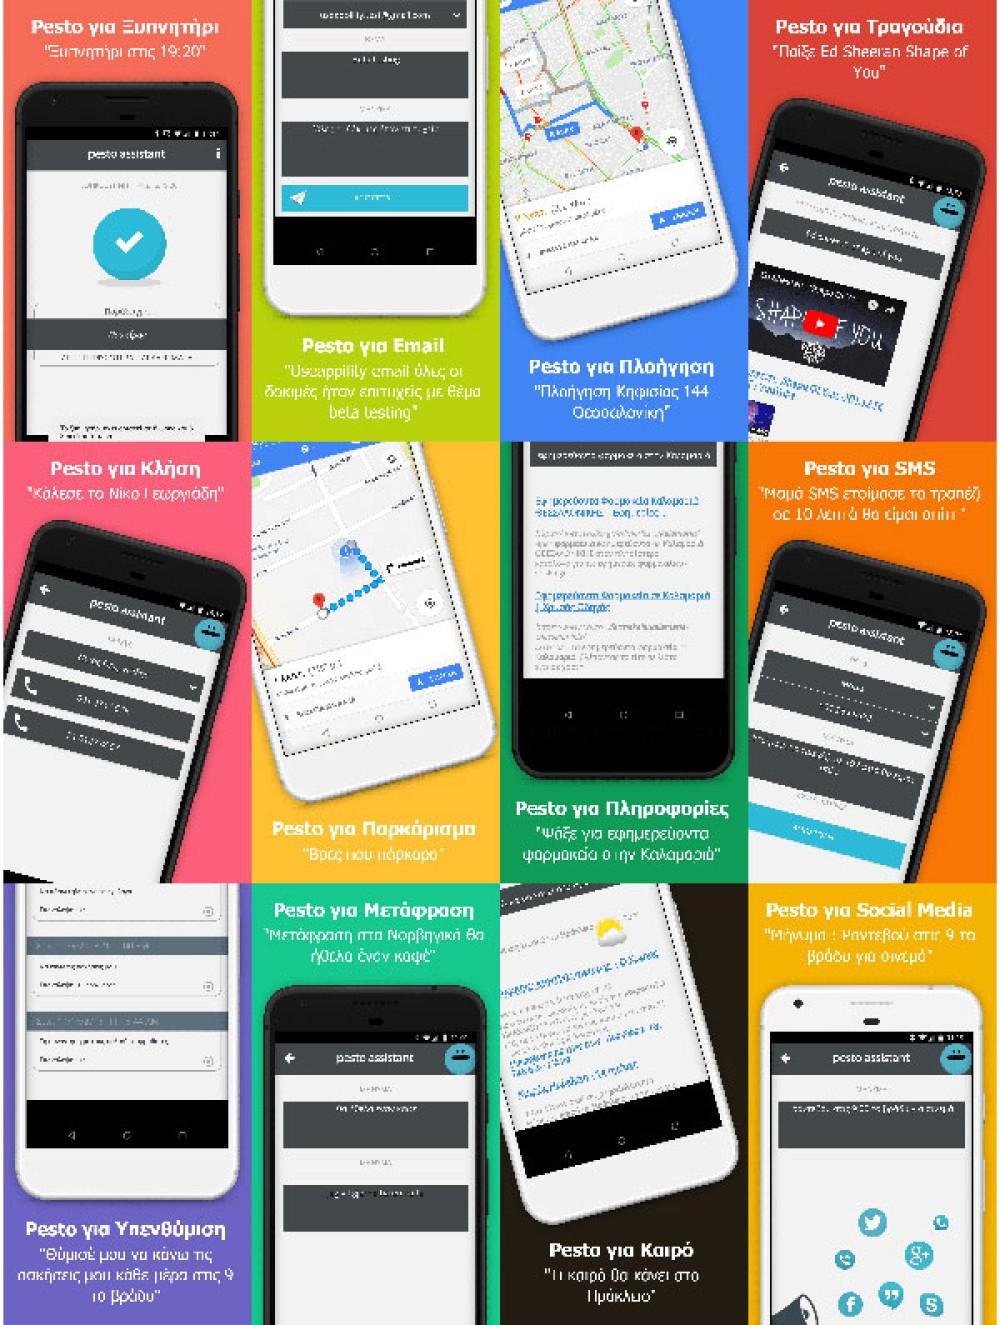 Pesto Assistant : Ένας νέος ψηφιακός βοηθός που καταλαβαίνει και μιλάει Ελληνικά για όλες τις συσκευές Android [Video]